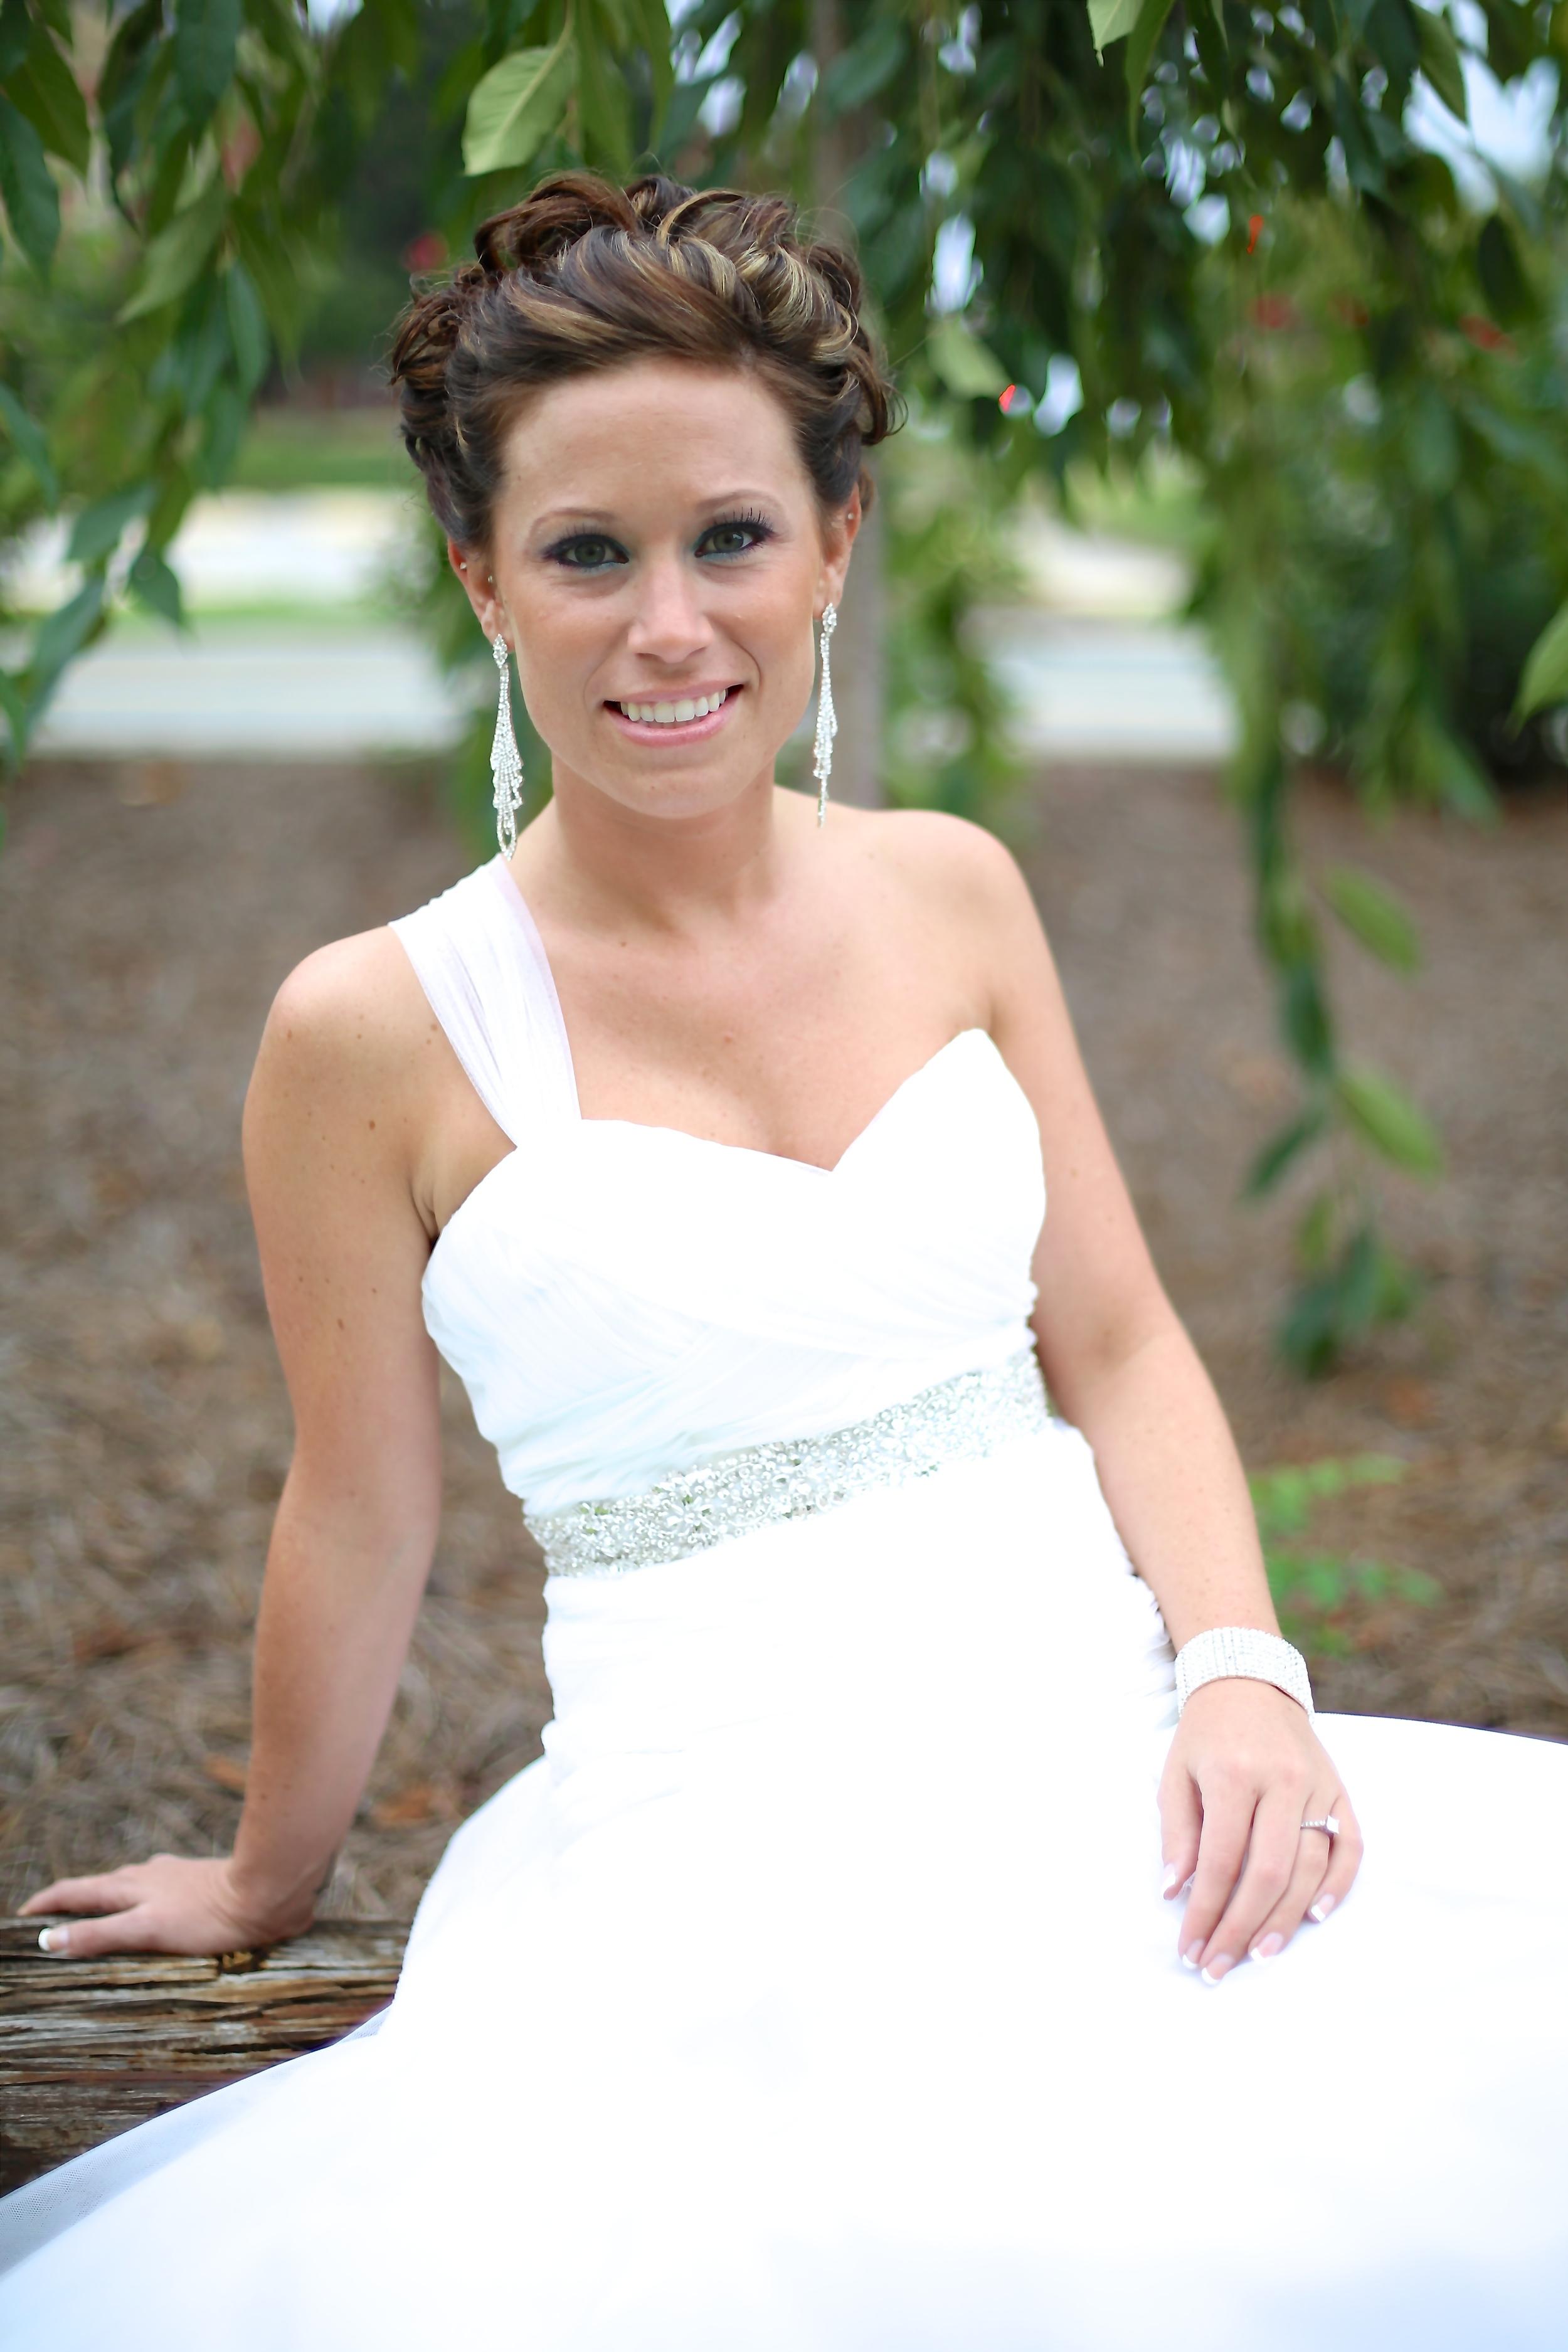 joanna bridal shoot 10